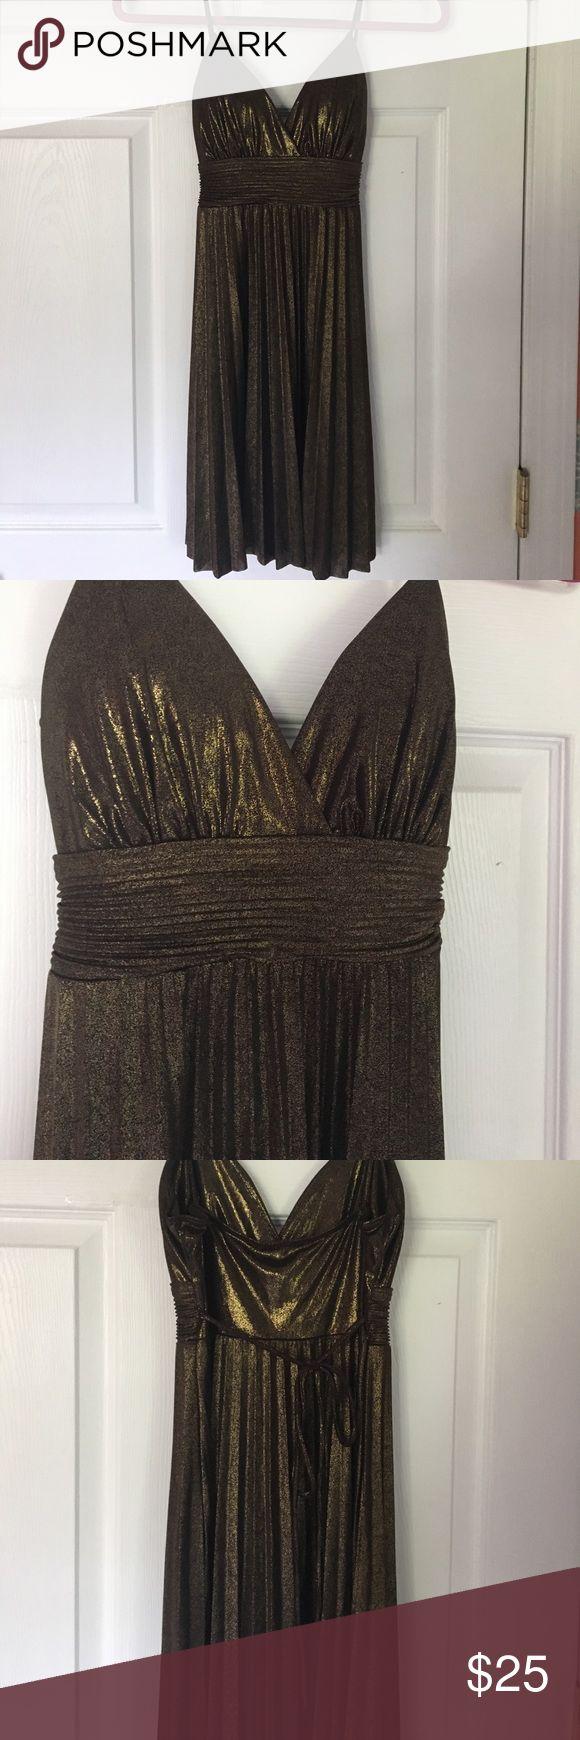 Gold/black Metallic Mini Dress Gold/black Metallic Mini Dress. Size Small. flamingo Dresses Mini